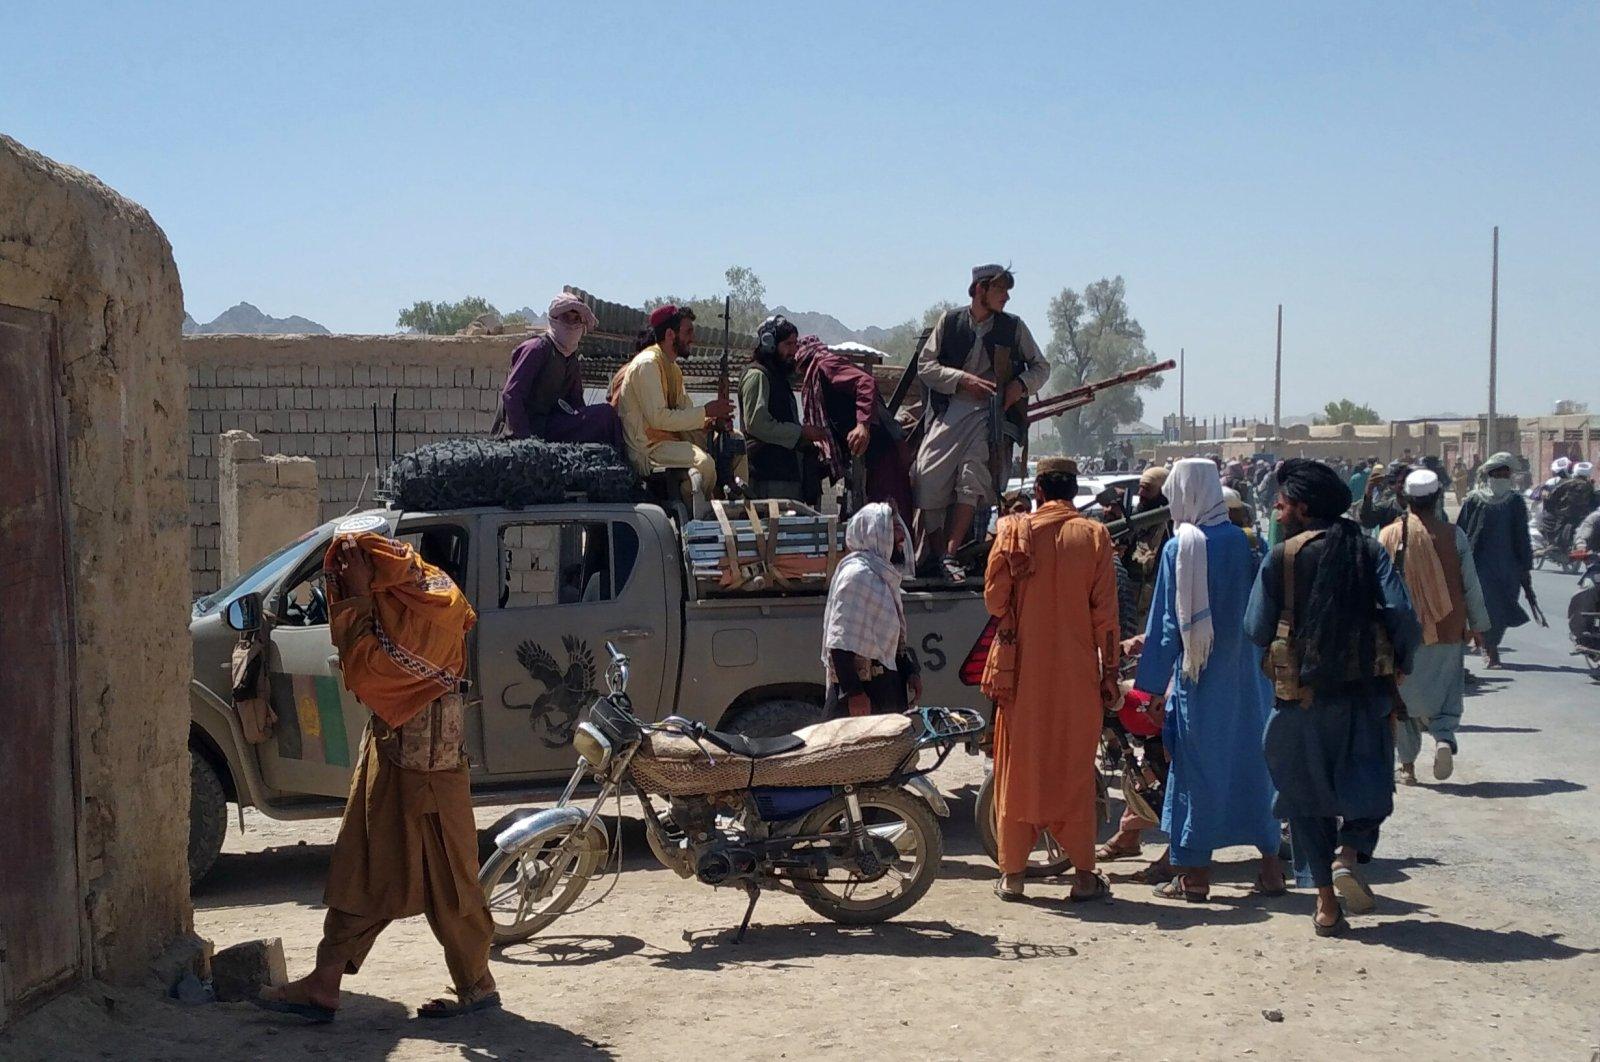 Taliban fighters patrol inside the city of Farah, capital of Farah province, southwest Afghanistan, Aug. 11, 2021. (AP Photo)